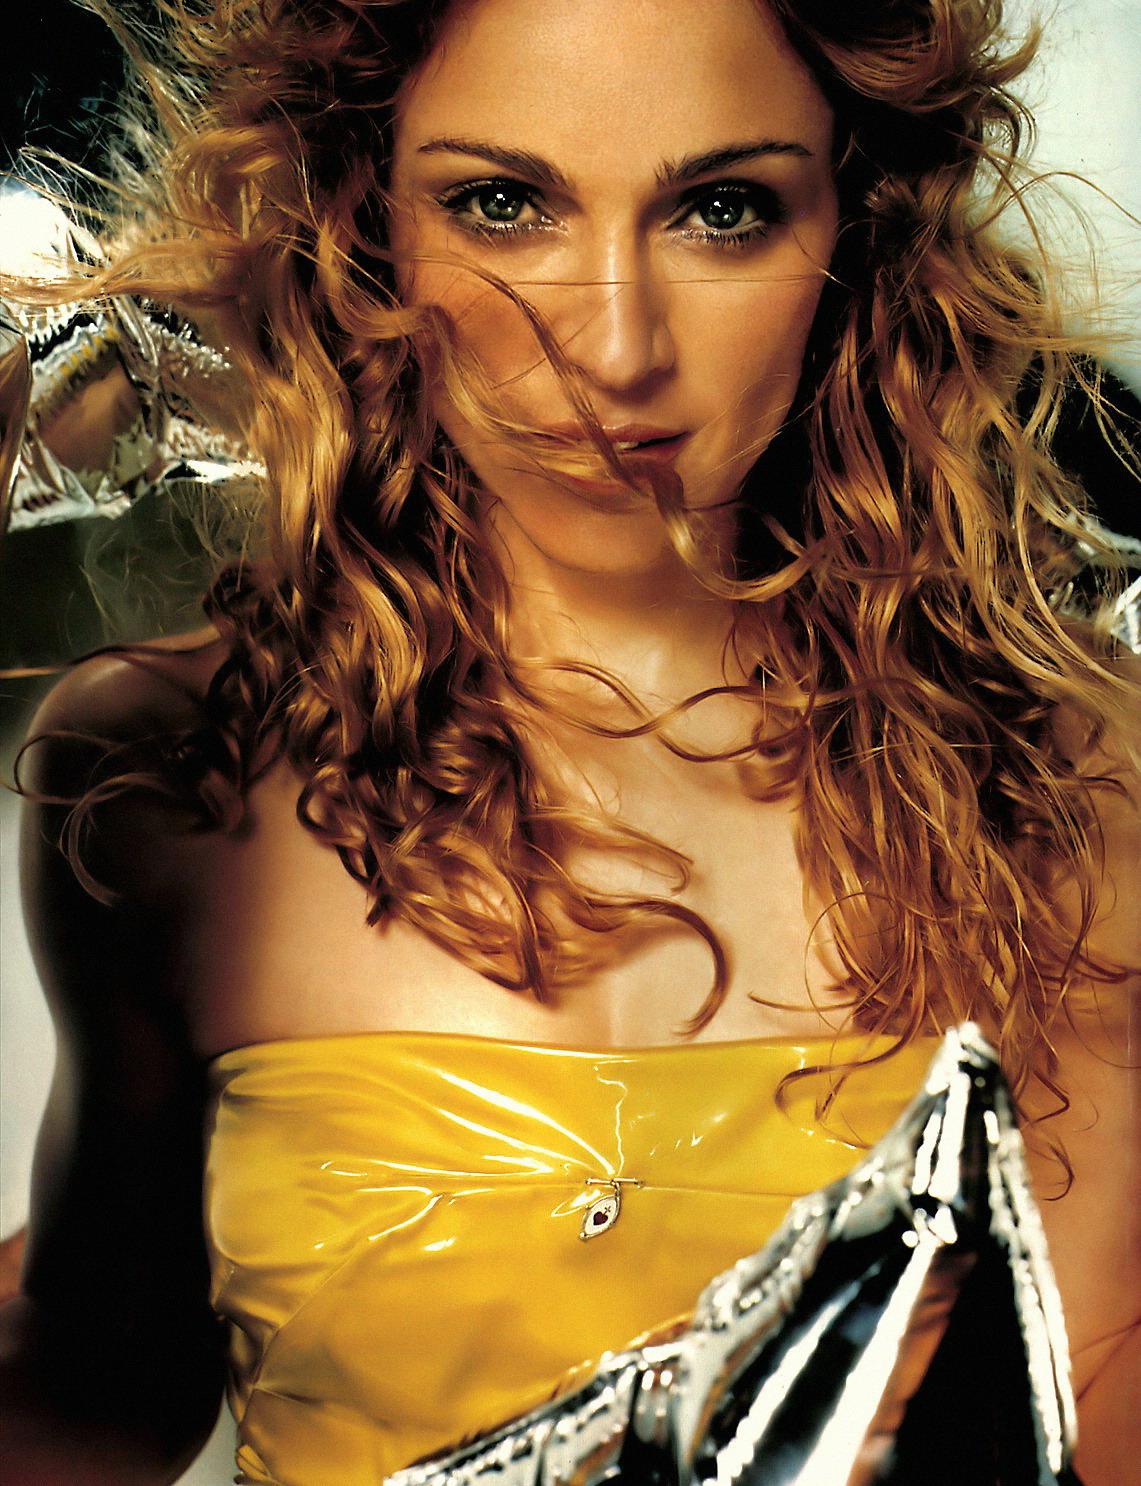 Madonna photo 87 of 1188 pics, wallpaper - photo #43819